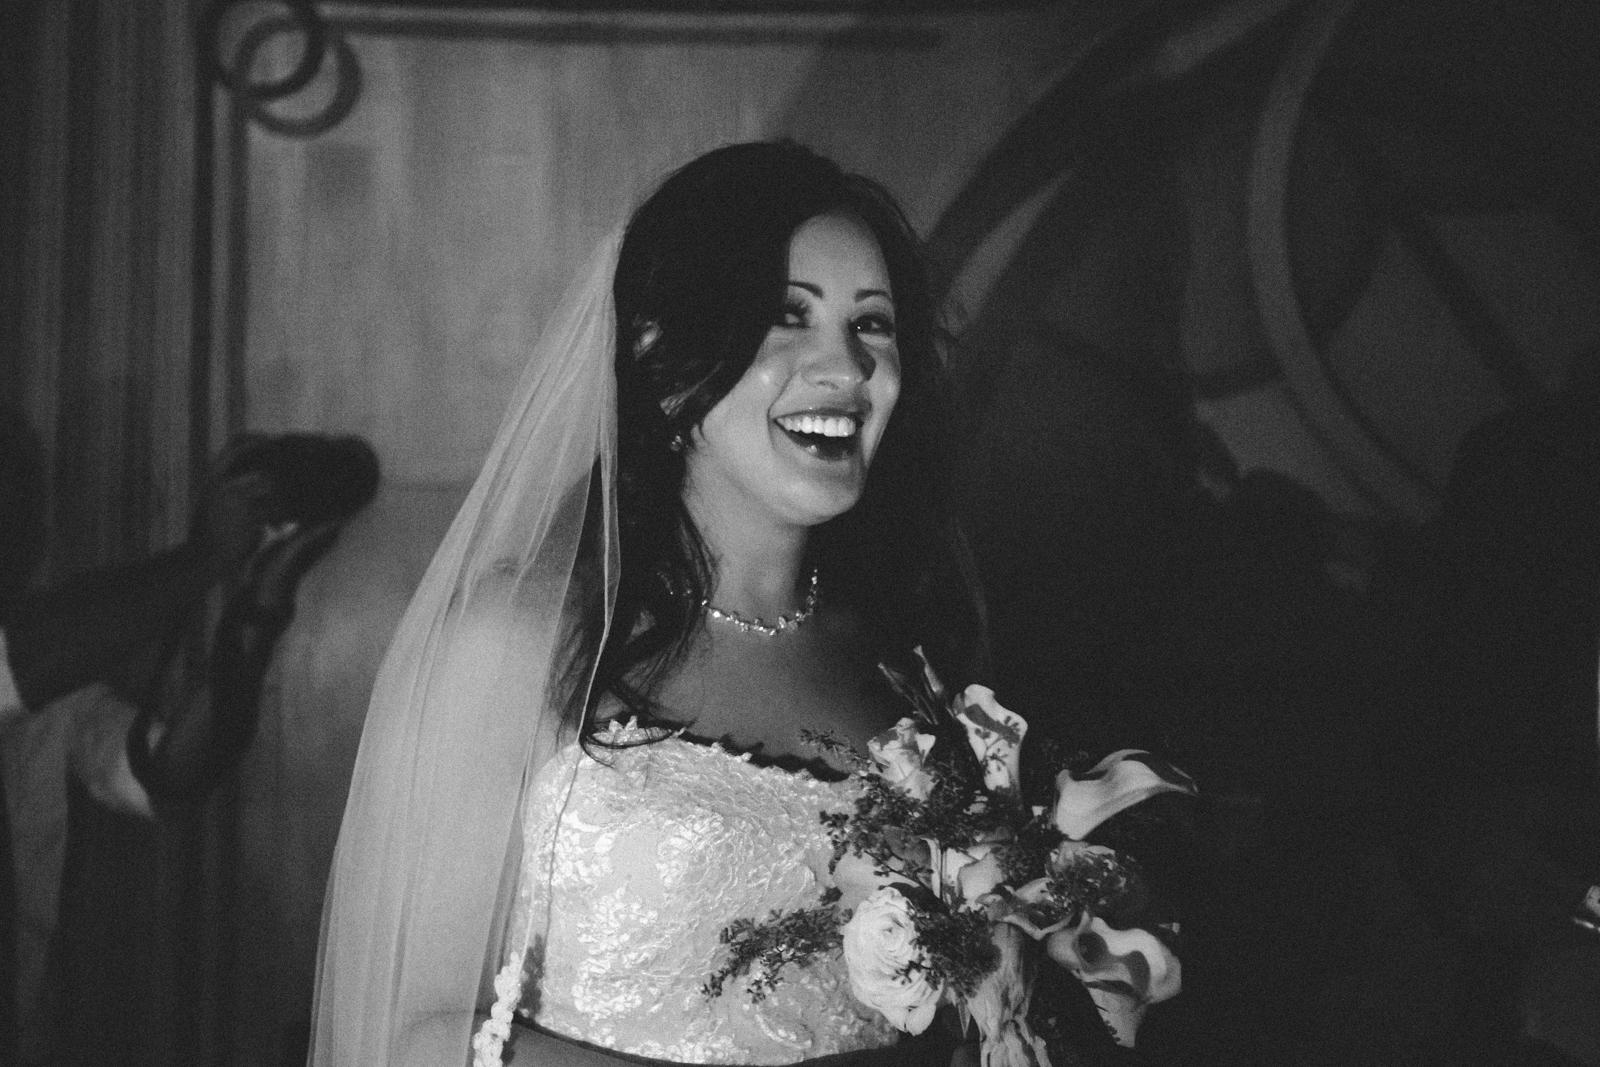 NYC Wedding Photography Lofts at Prince Brooklyn NYC Photographer Boris Zaretsky _B2C0904.jpg